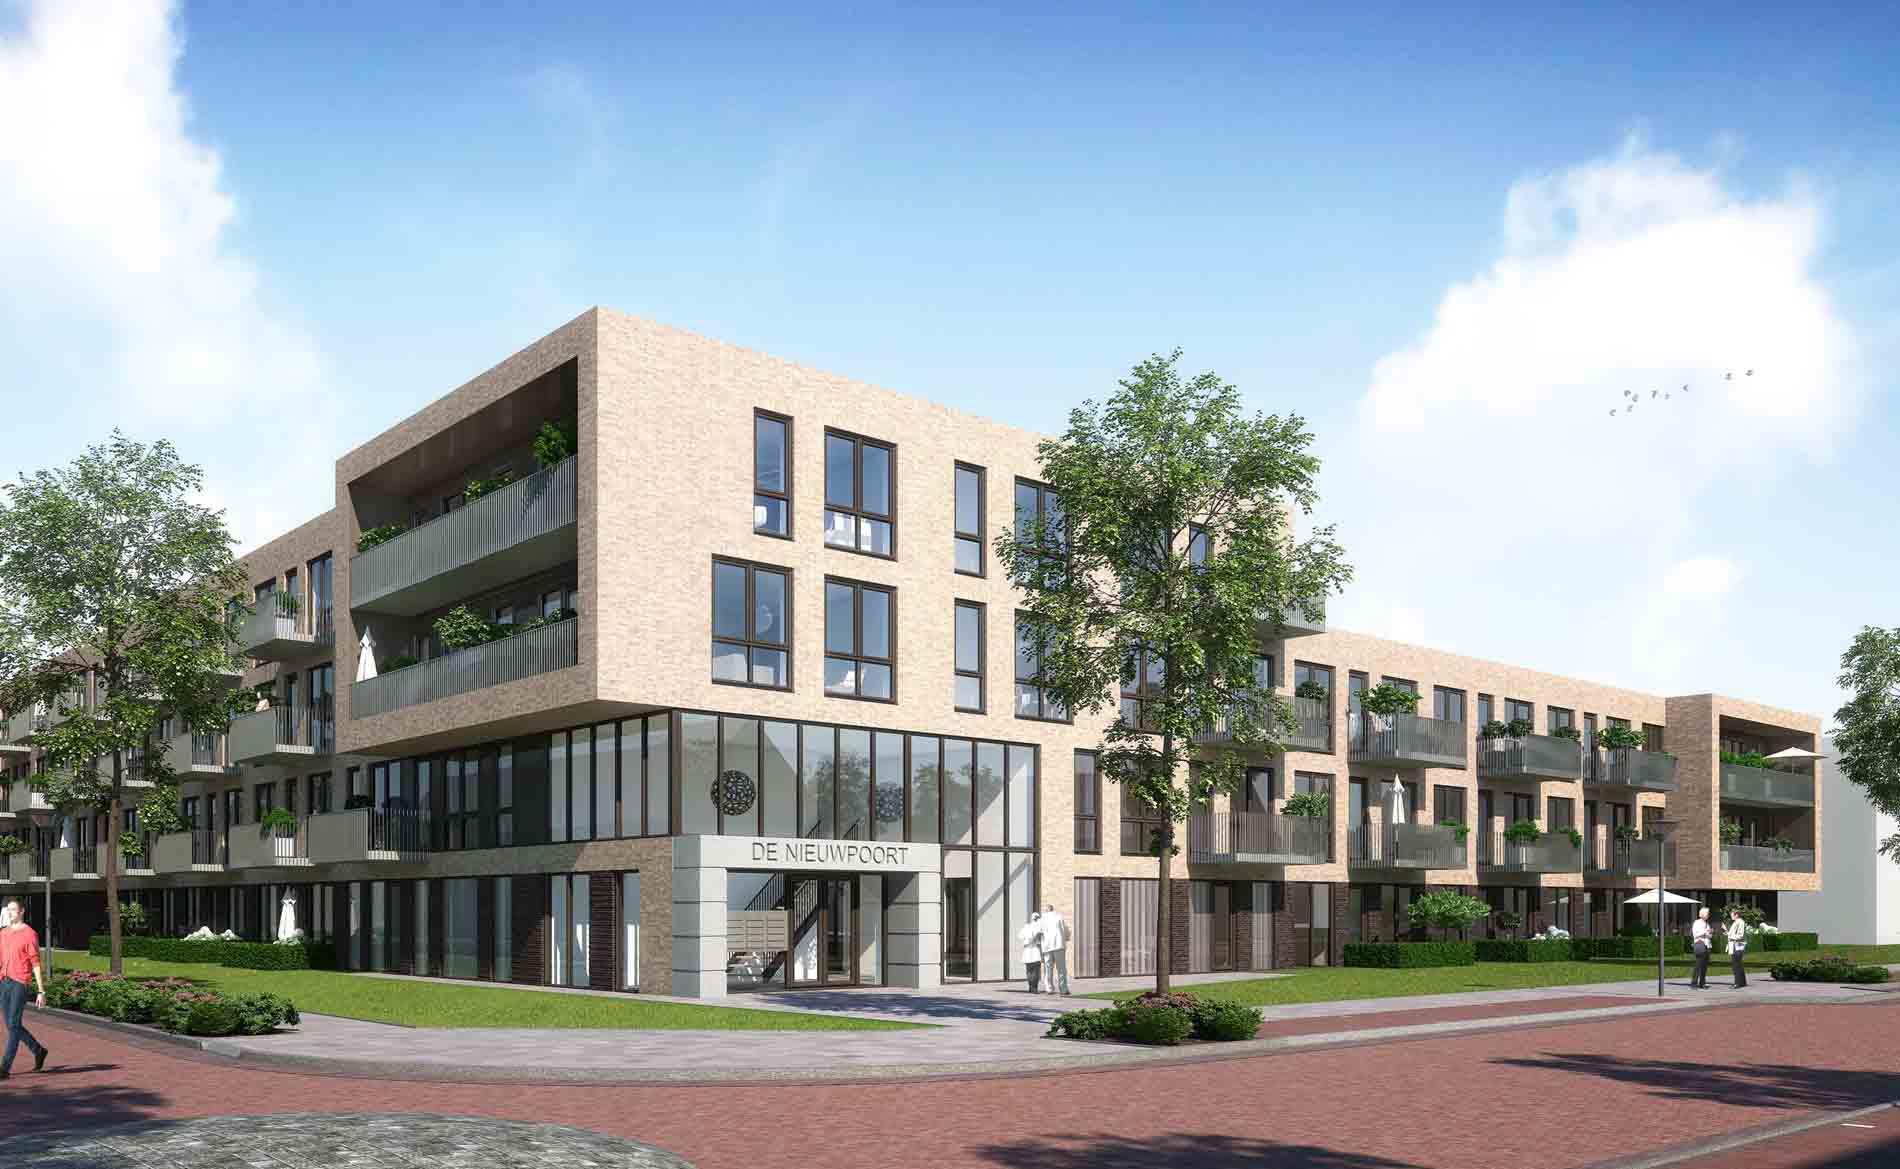 Alkmaar De Nieuwpoort appartementen BBHD architecten senioren woningen woningbouw huurwoningen woonzorg architectuur NOM-ready moderne architectuur